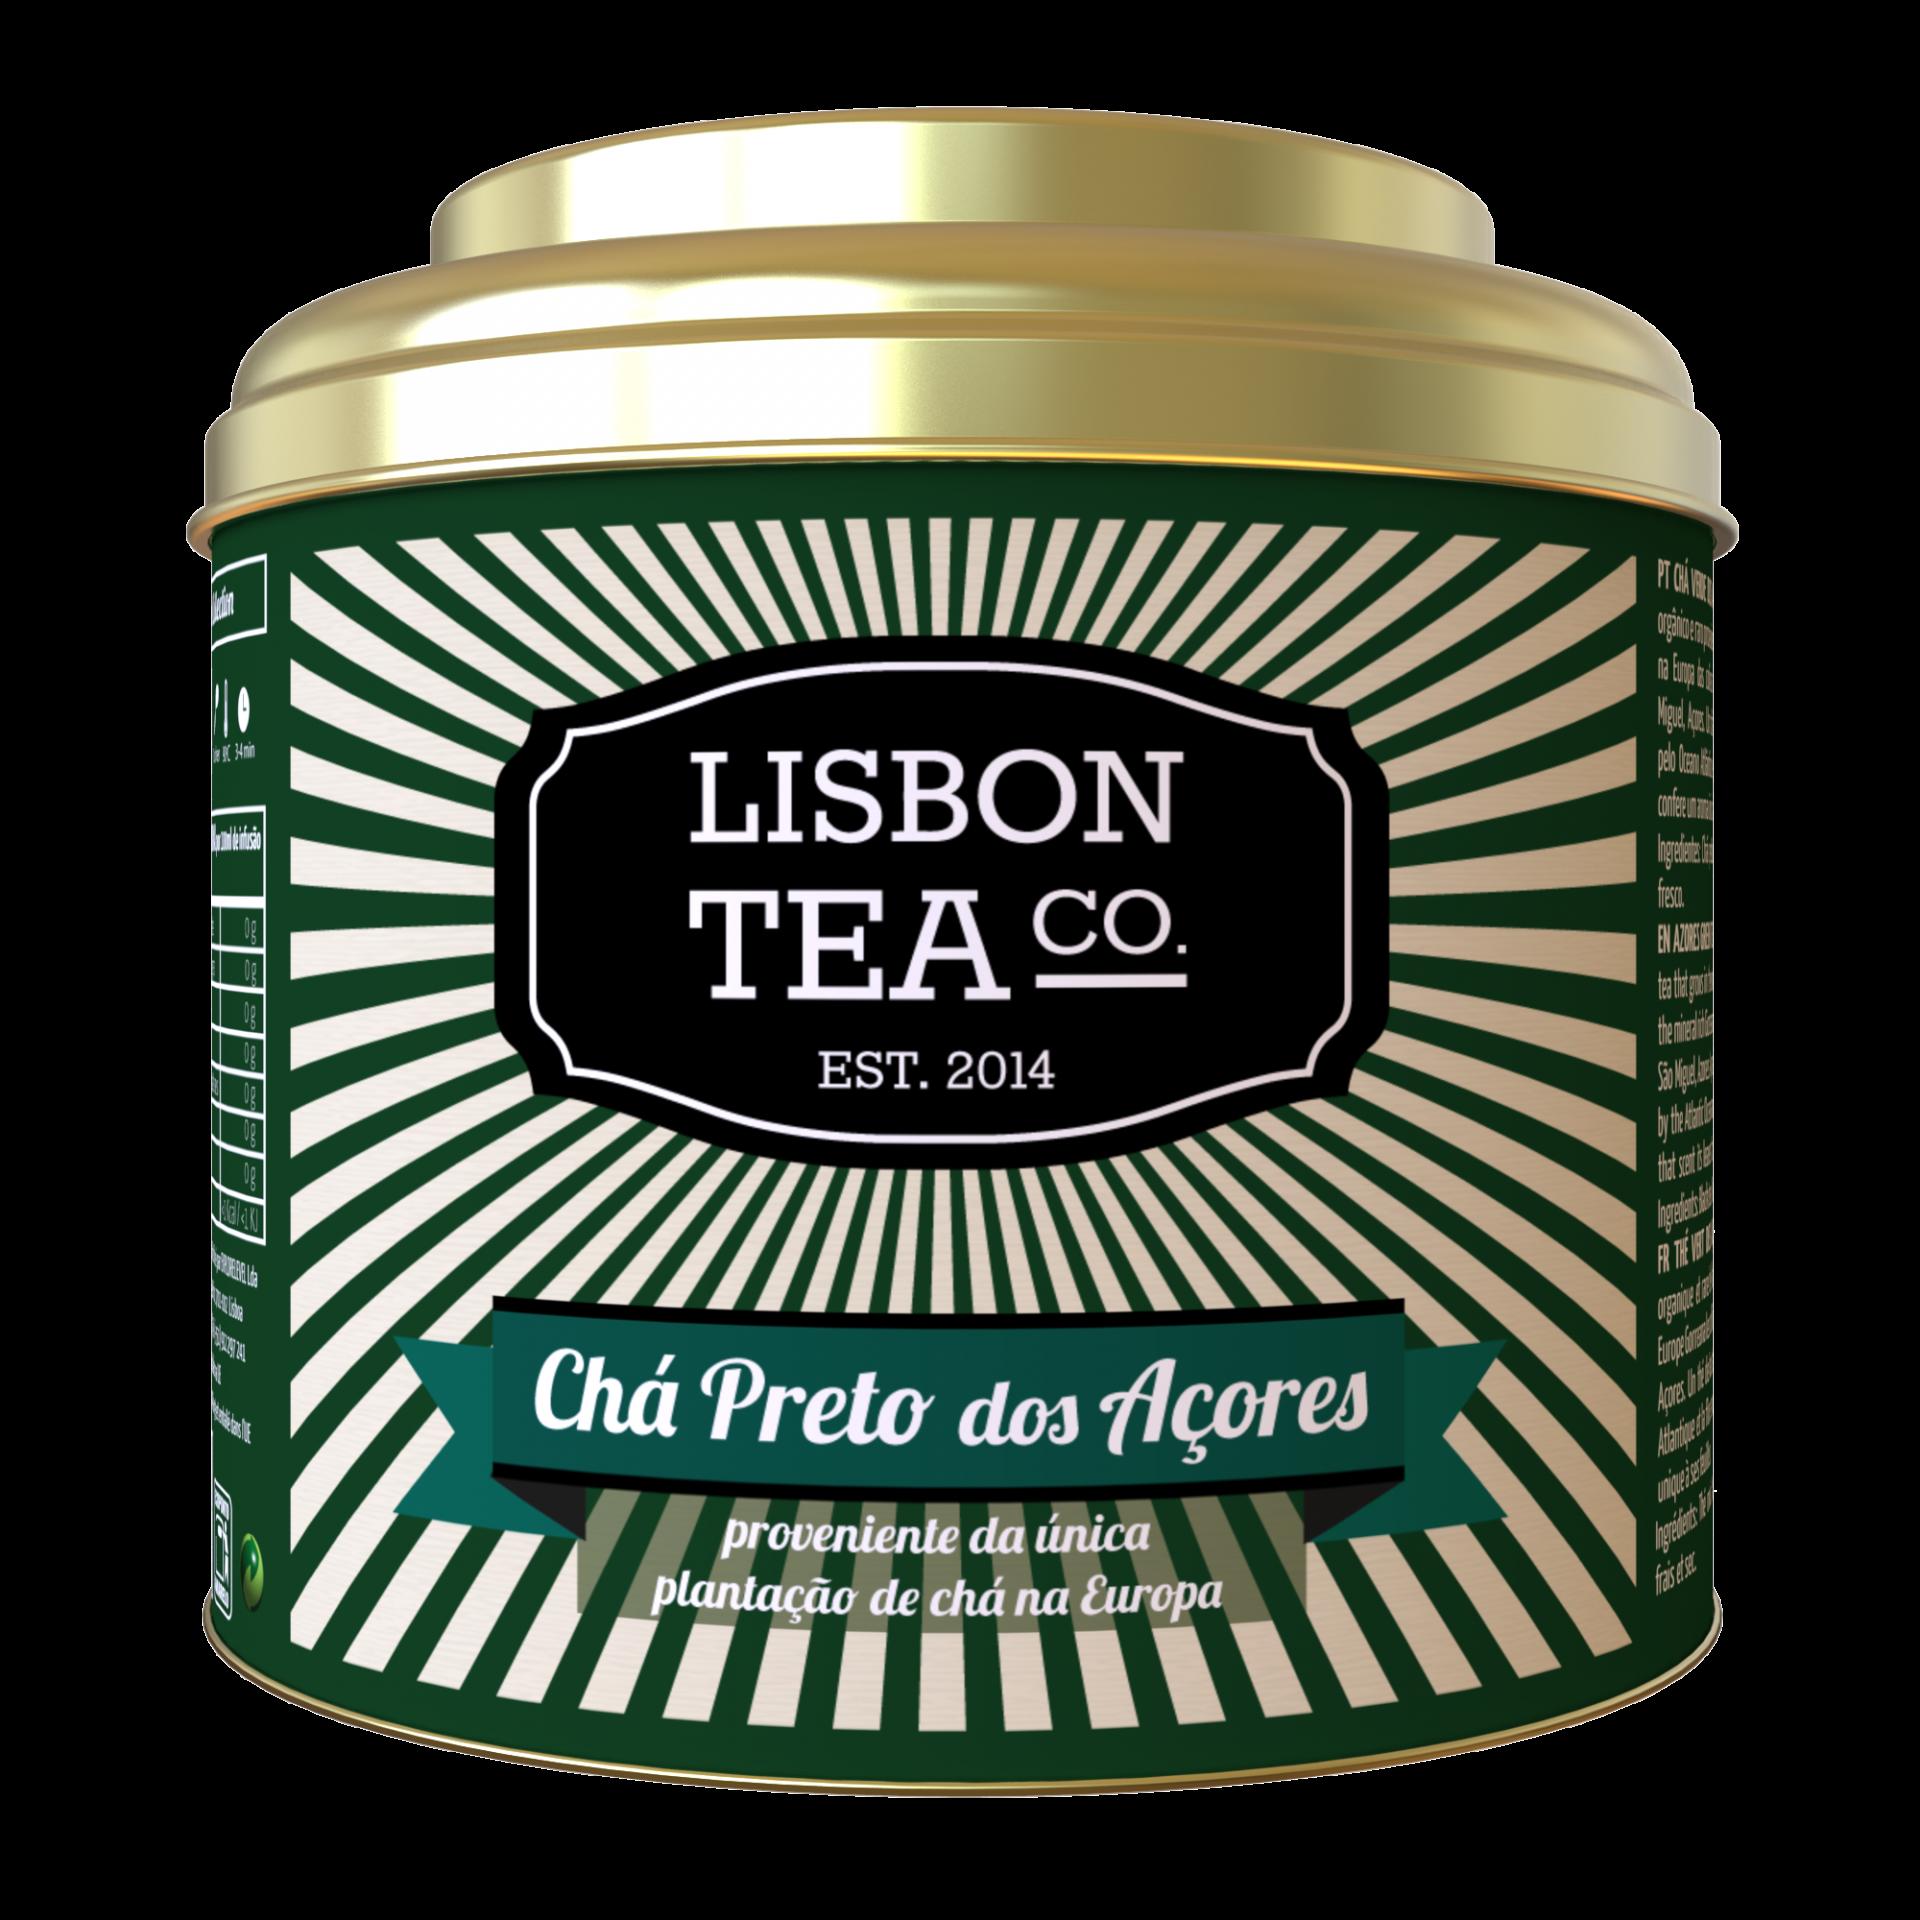 Lisbon Tea Preto Açores Chá